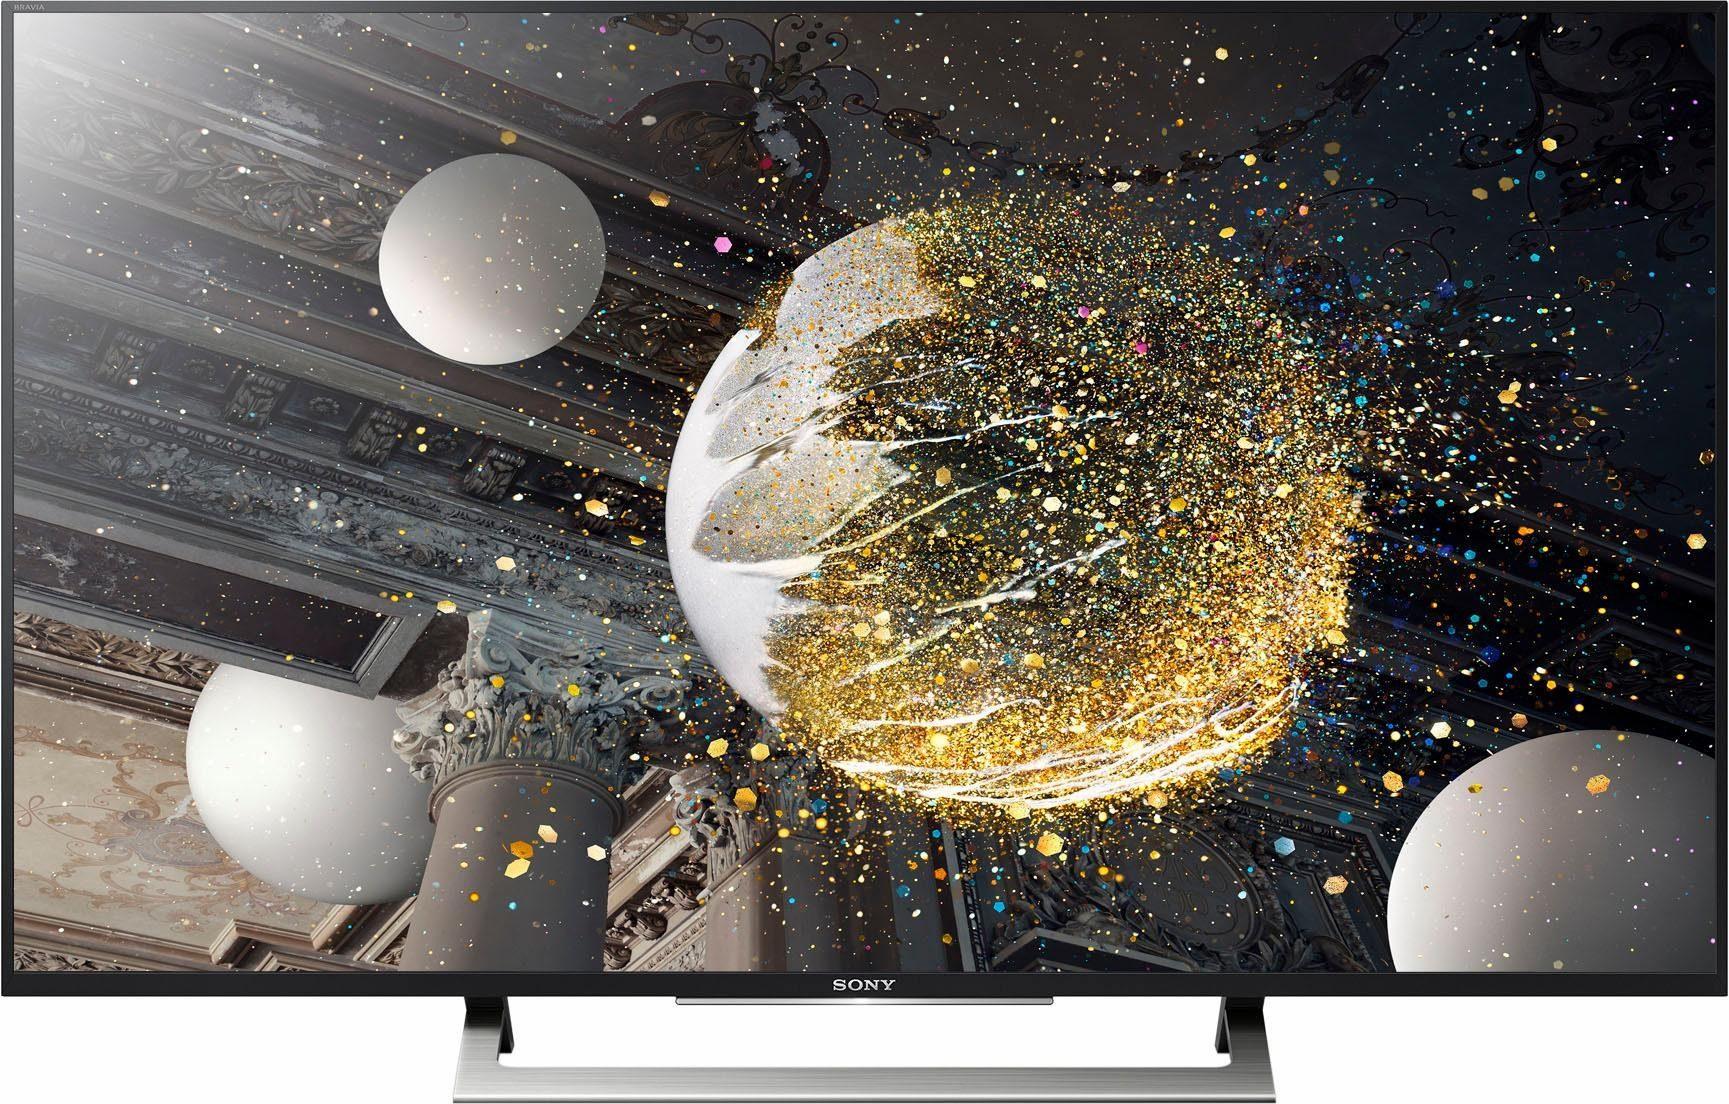 Sony KD-43XD8005, LED Fernseher, 108 cm (43 Zoll), 2160p (4K Ultra HD), HDR, Smart-TV